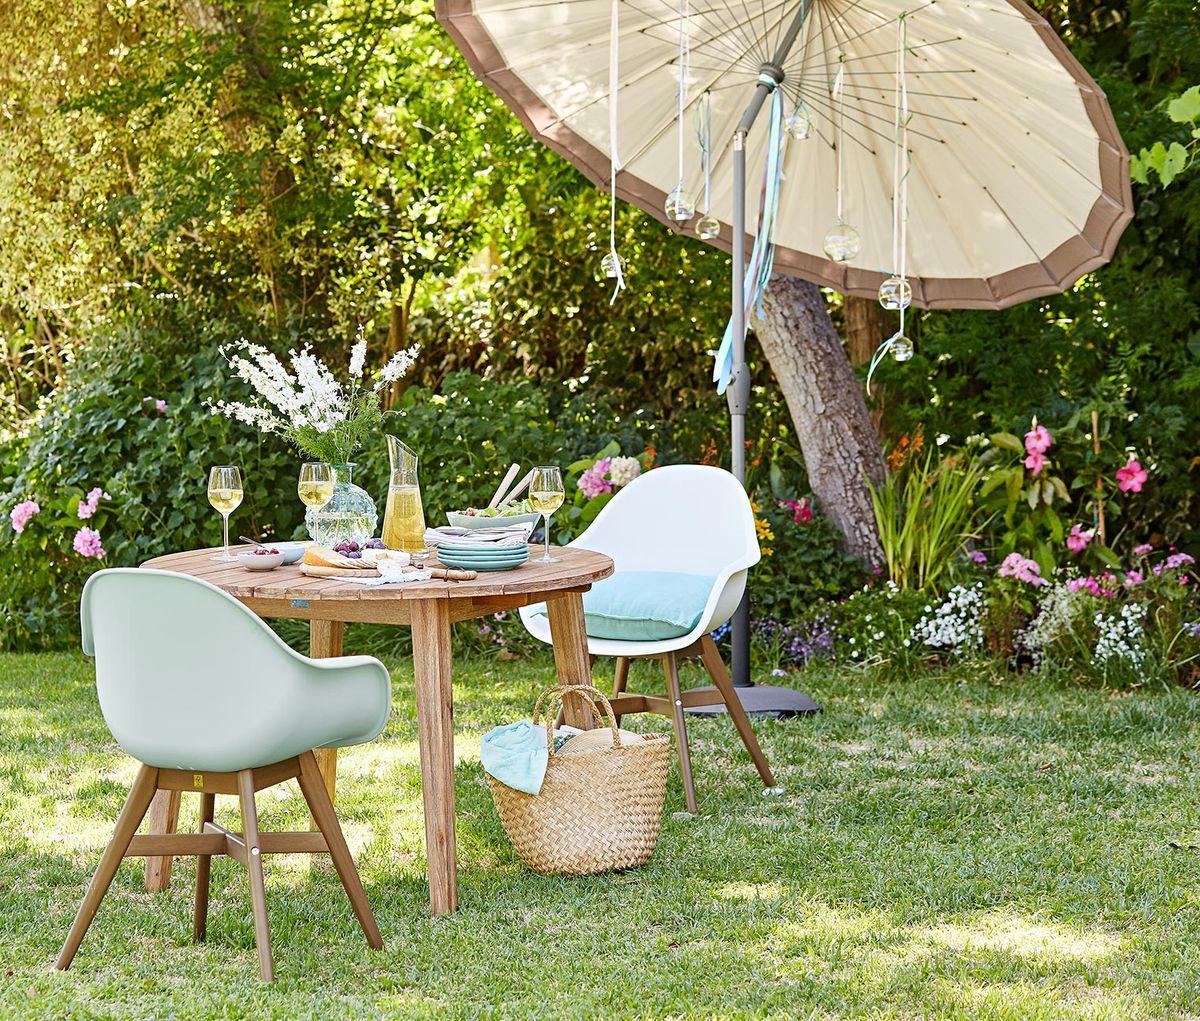 hranat dvojit p lkruhov aneb jak spr vn vybrat slune n k pro eny. Black Bedroom Furniture Sets. Home Design Ideas